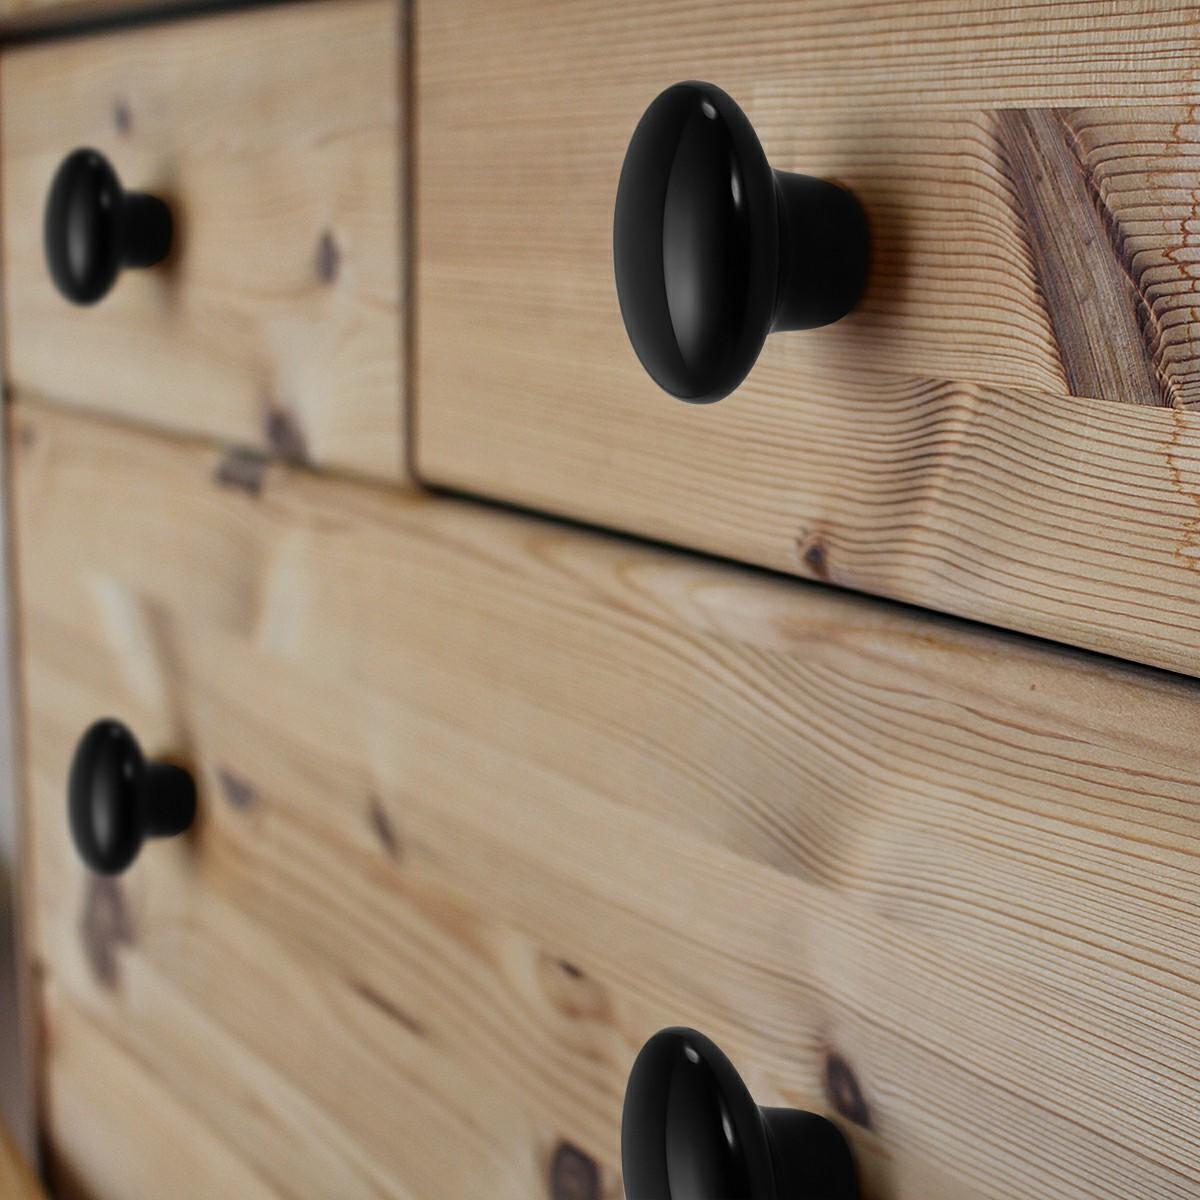 38mm Ceramic Single Hole Cupboard Handles Drawer Pulls - Black